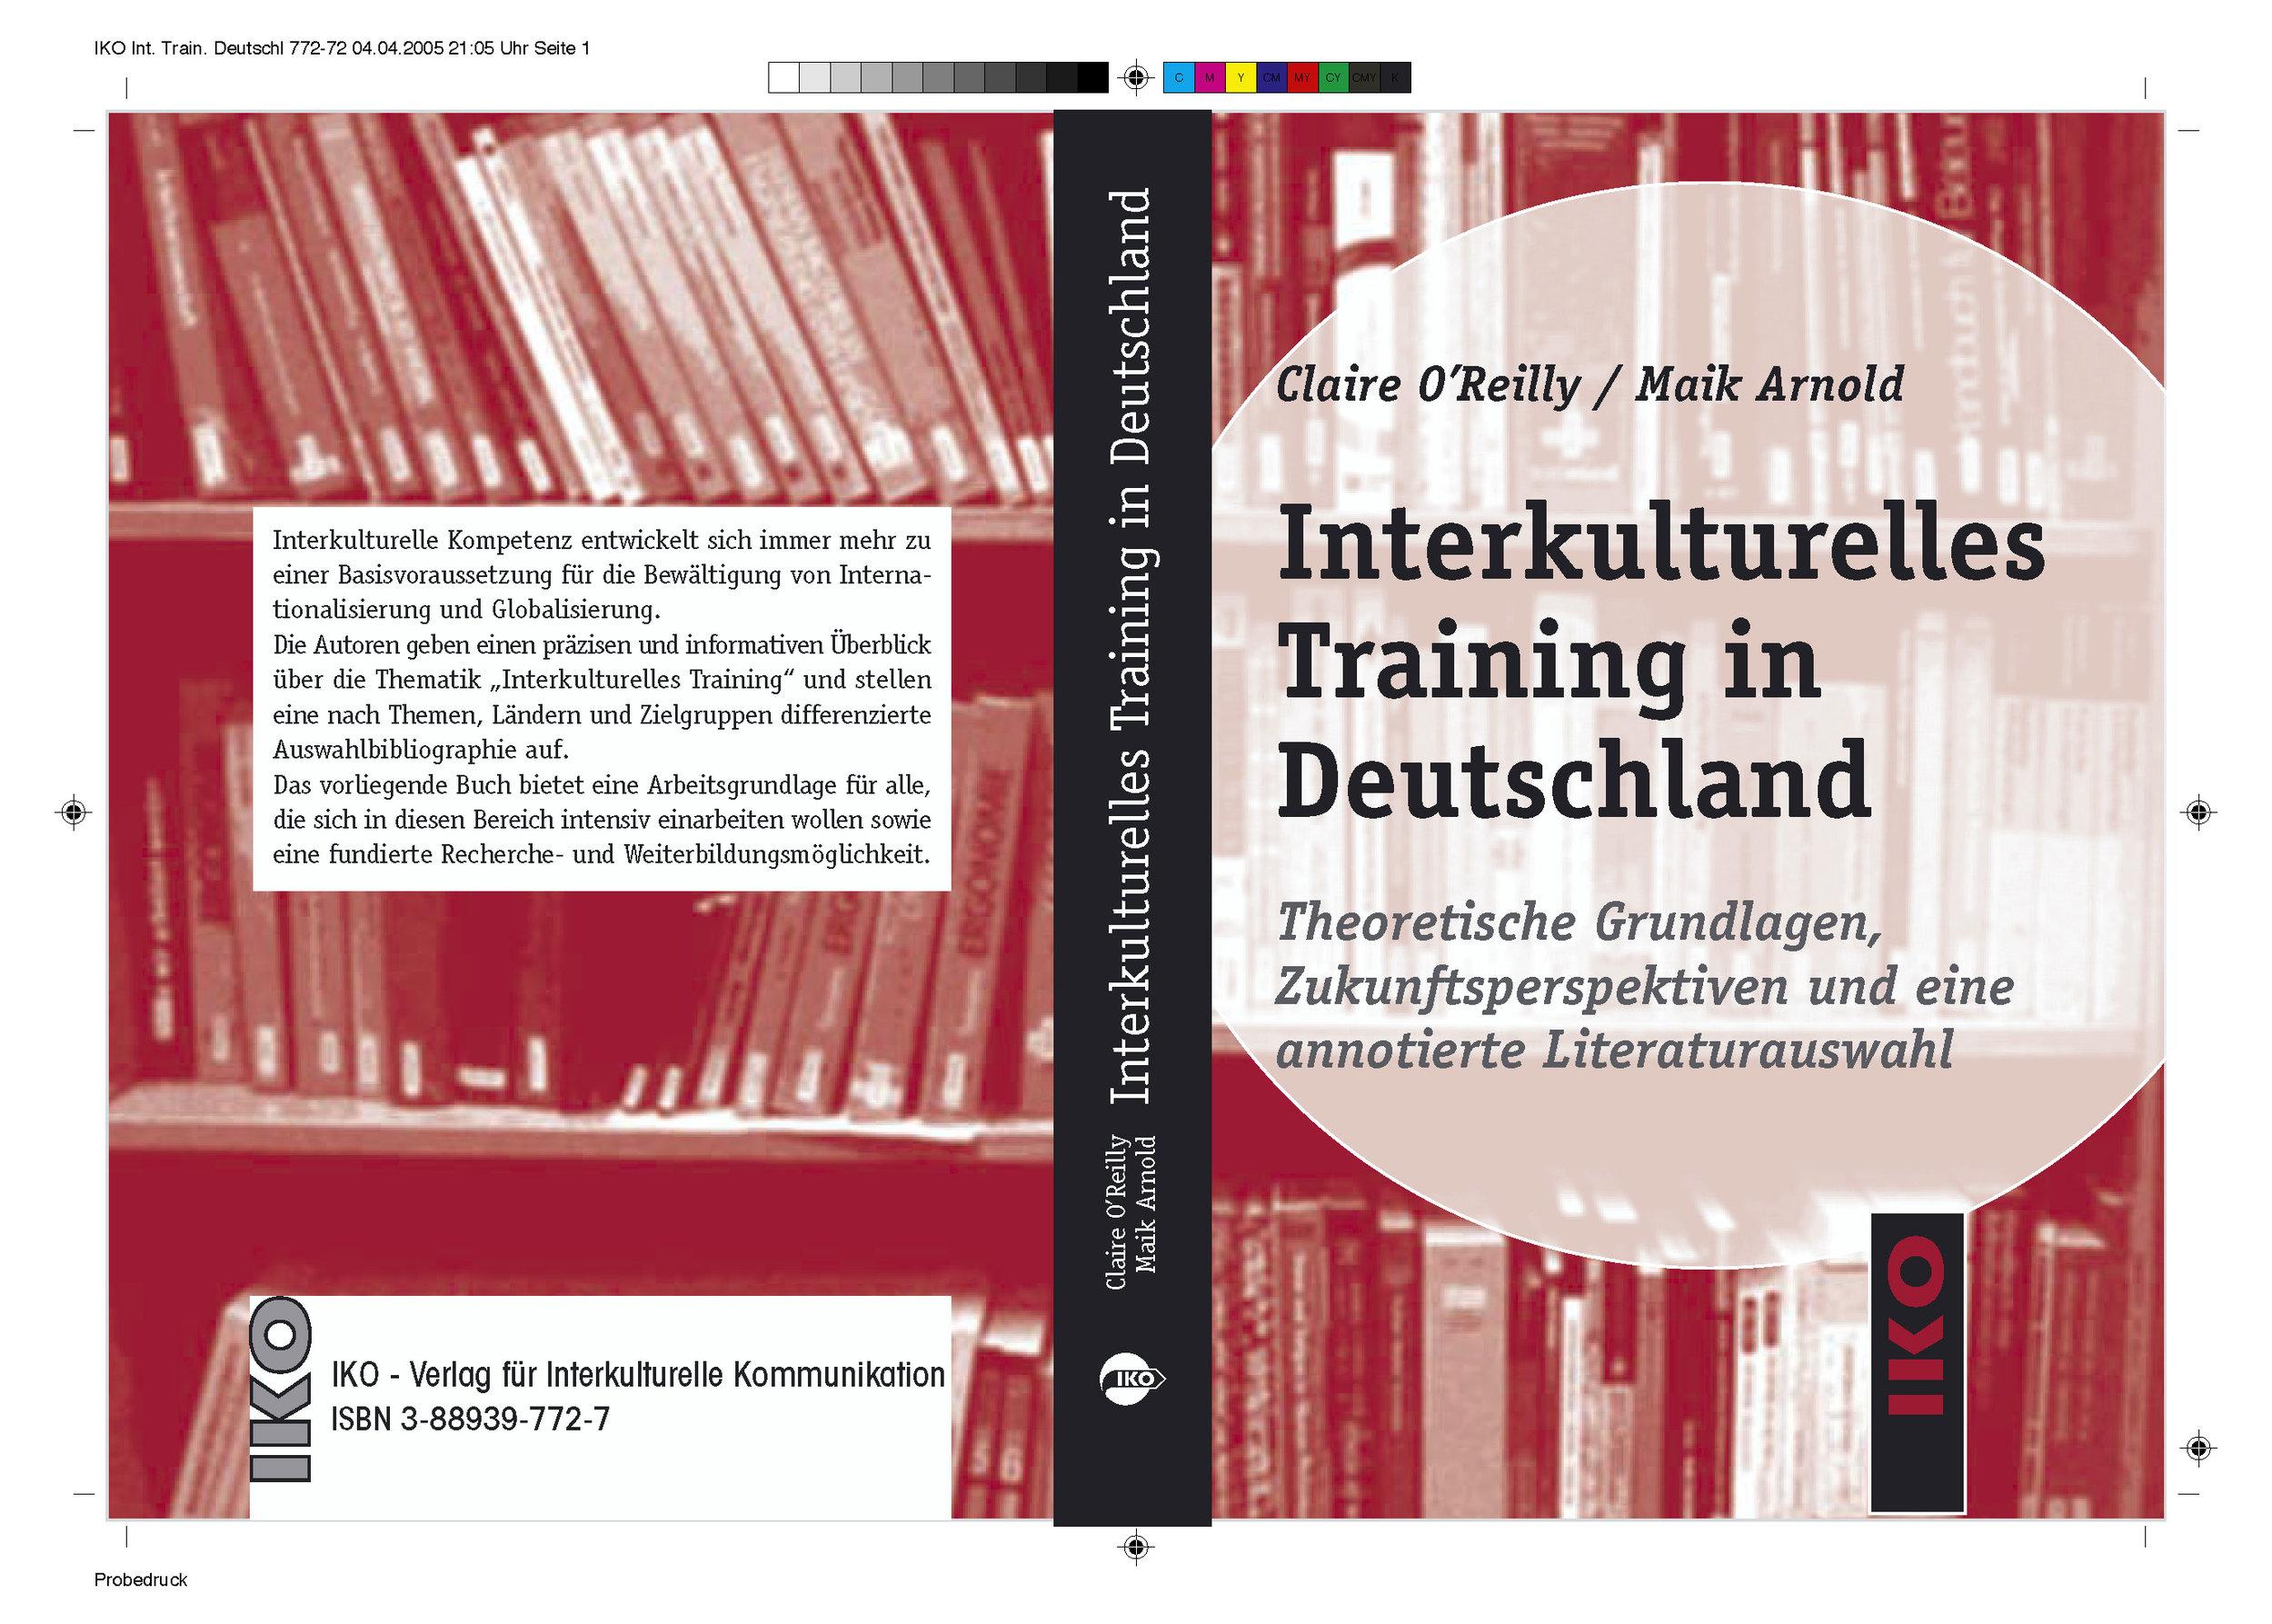 772-7-Cover-rot-und-blau-05.04.05_Page_1.jpg